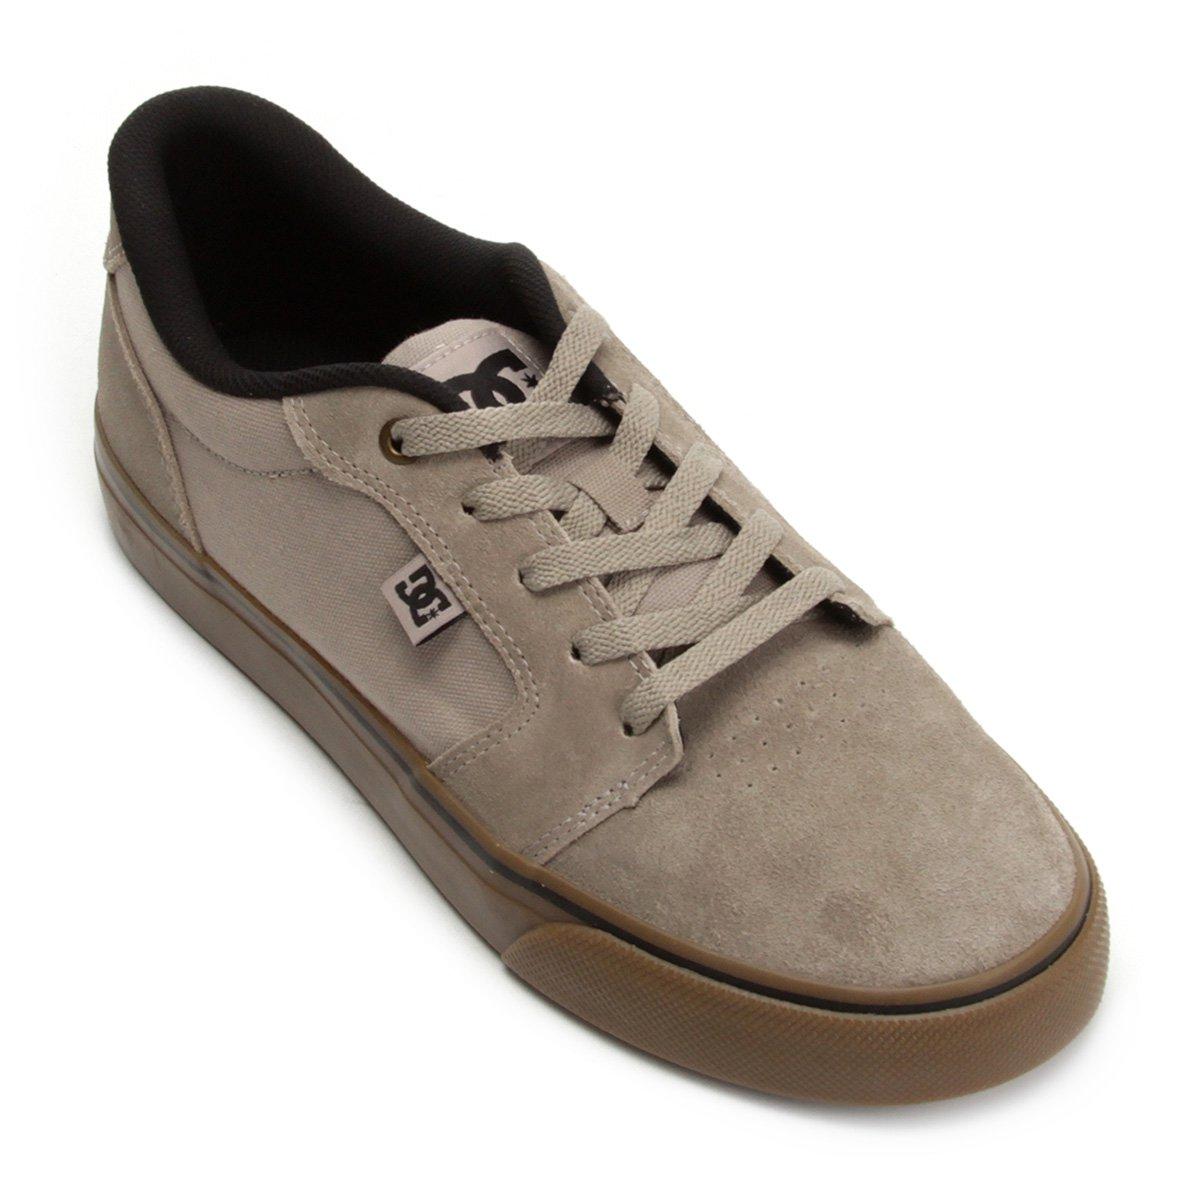 77d3d9dbeb Shopping Smiles - Tênis DC Shoes Anvil La Masculino